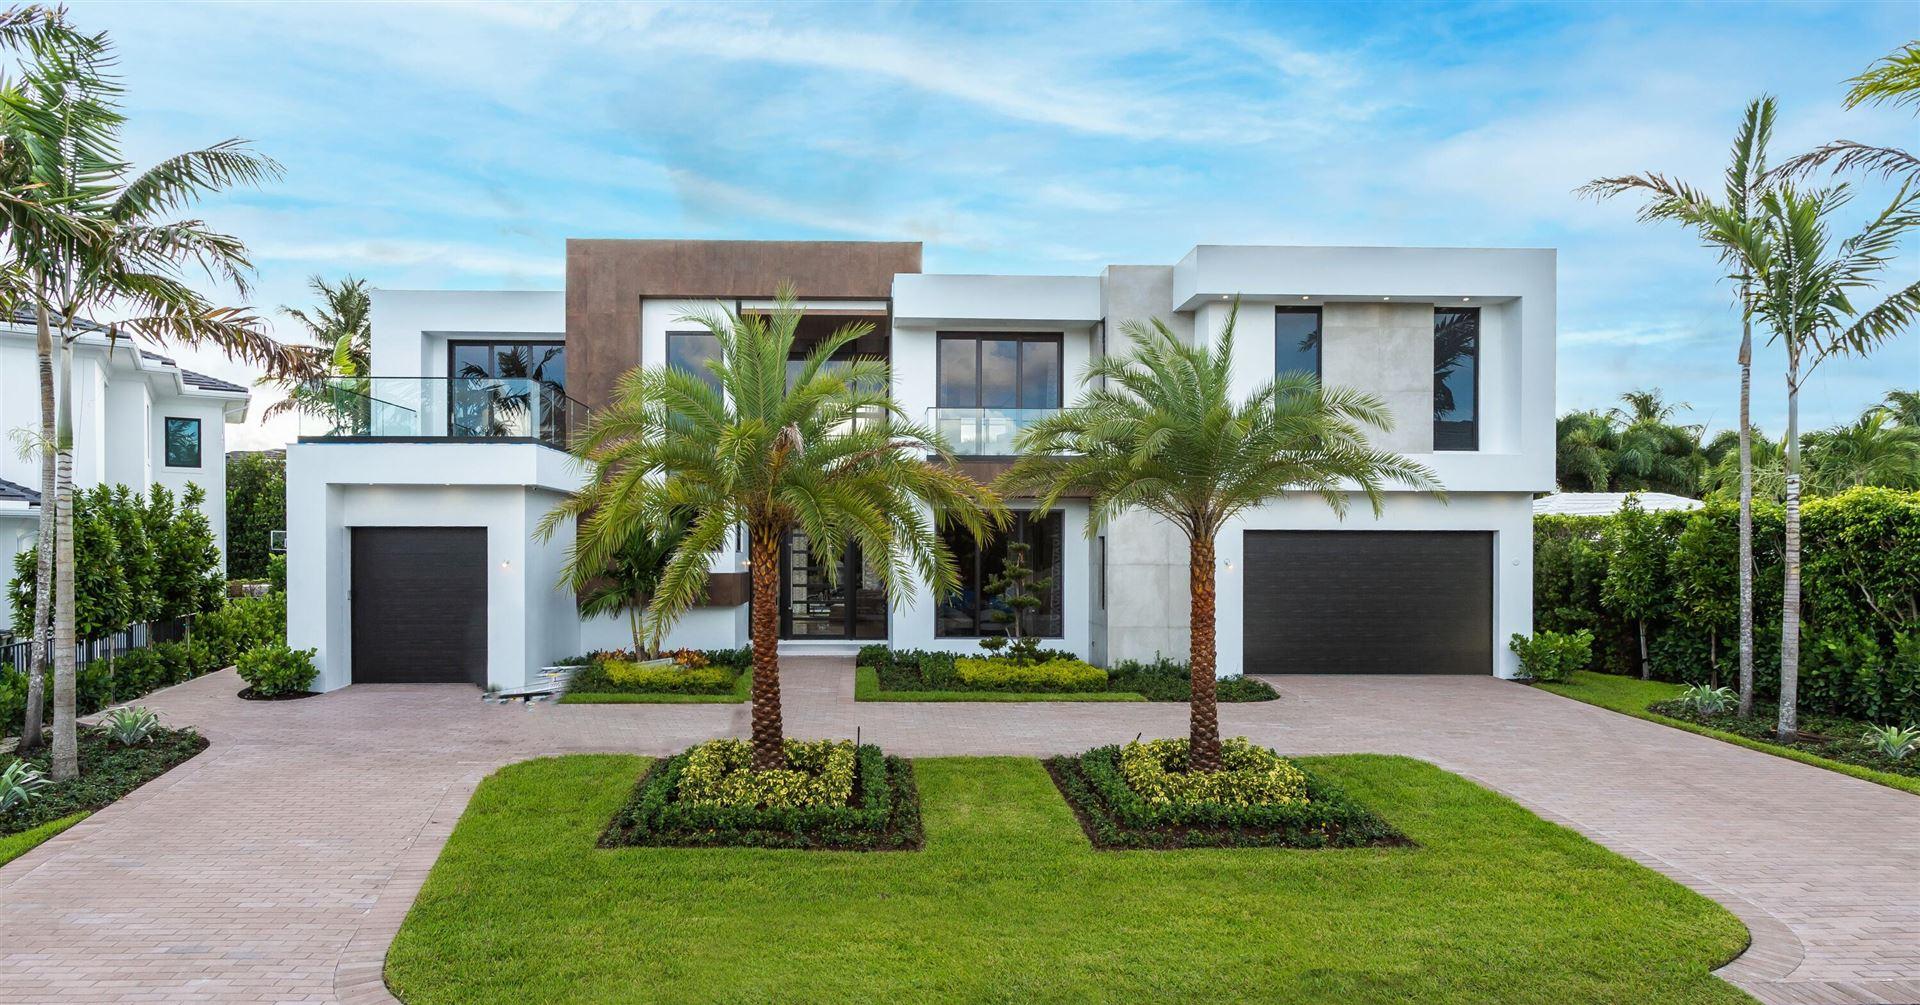 2391 Areca Palm Road, Boca Raton, FL 33432 - #: RX-10750875